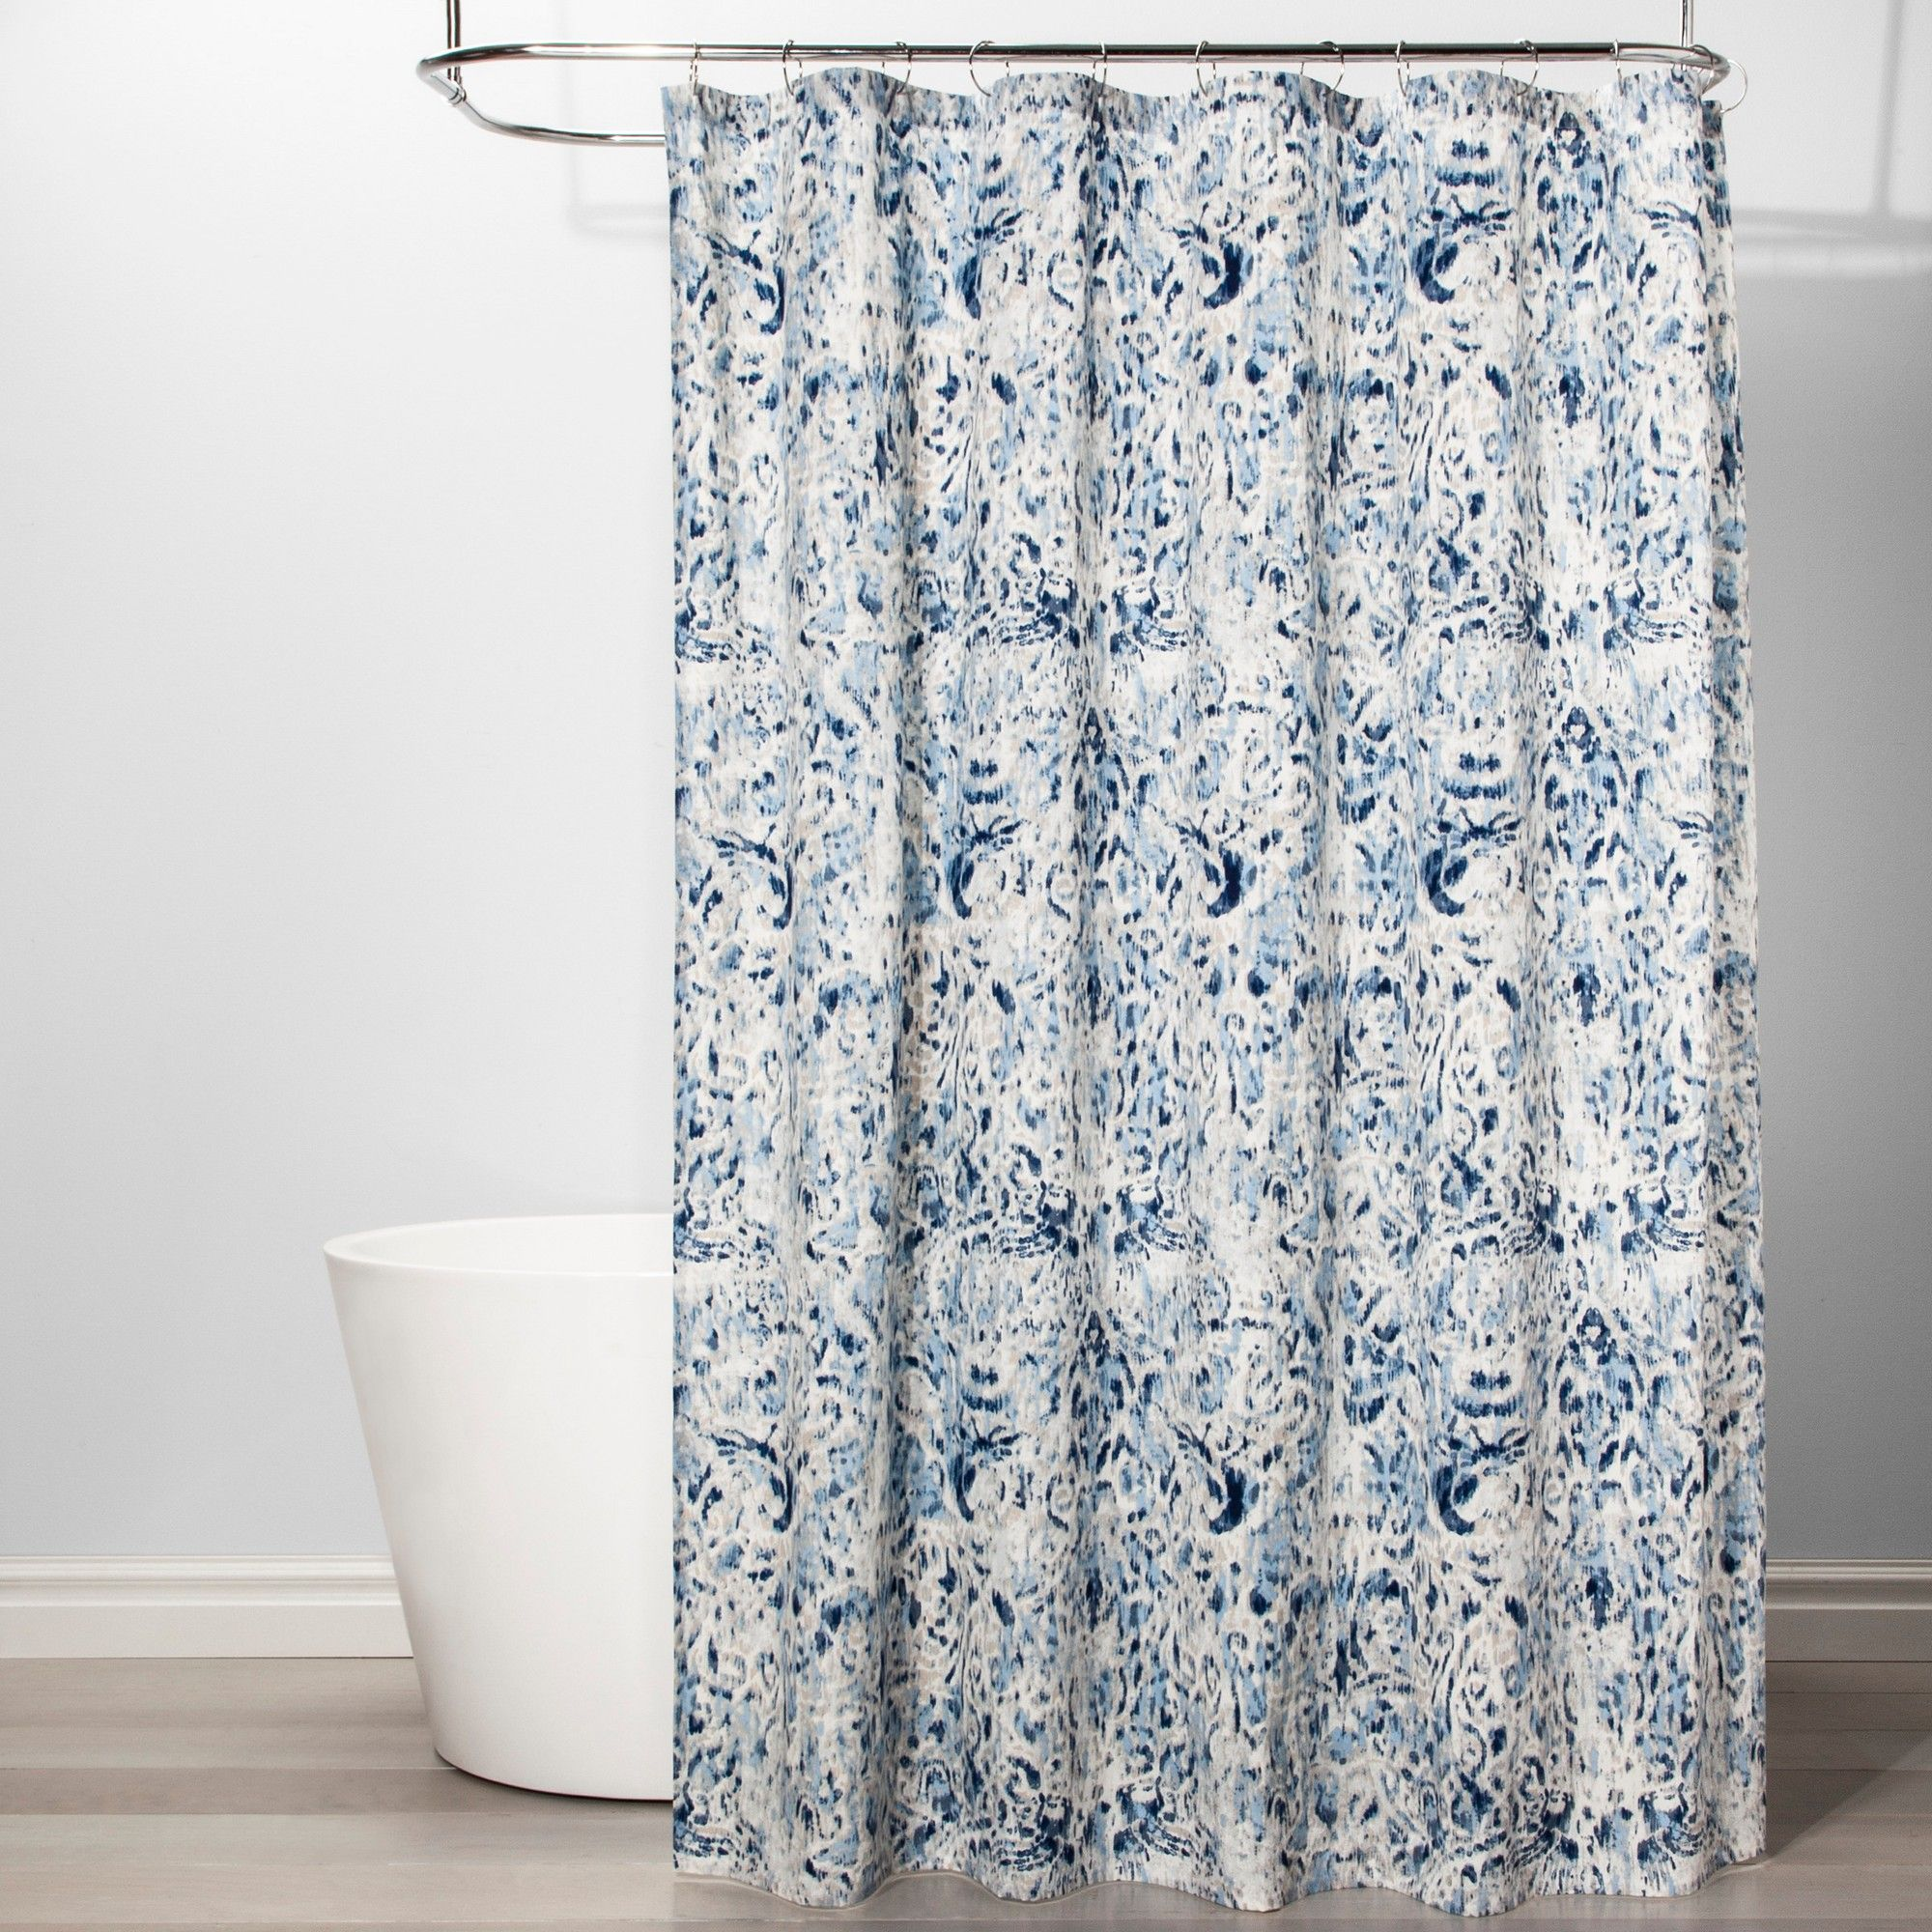 Ikat Design Shower Curtain Borage Blue Threshold Adult Unisex Black Shower Curtains Blue Shower Curtains